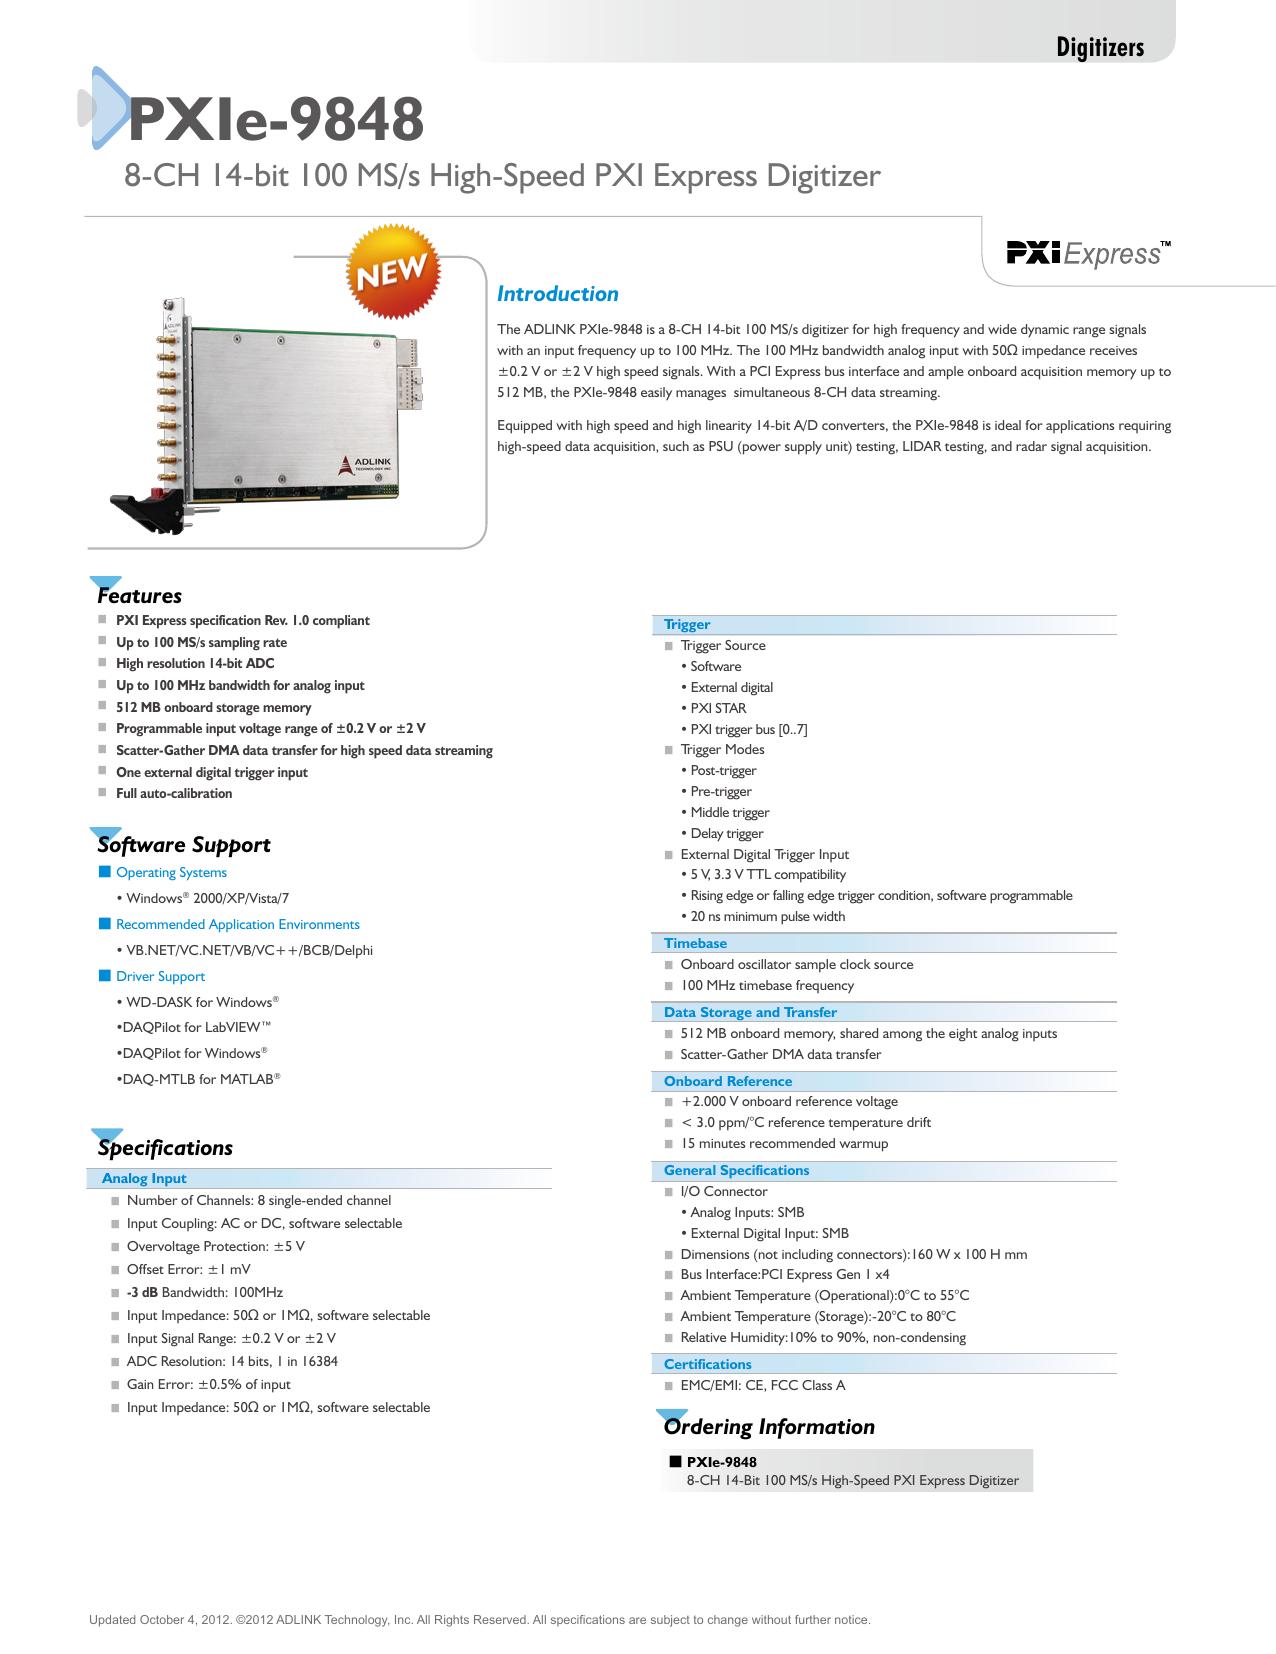 PXIe-9848   manualzz com